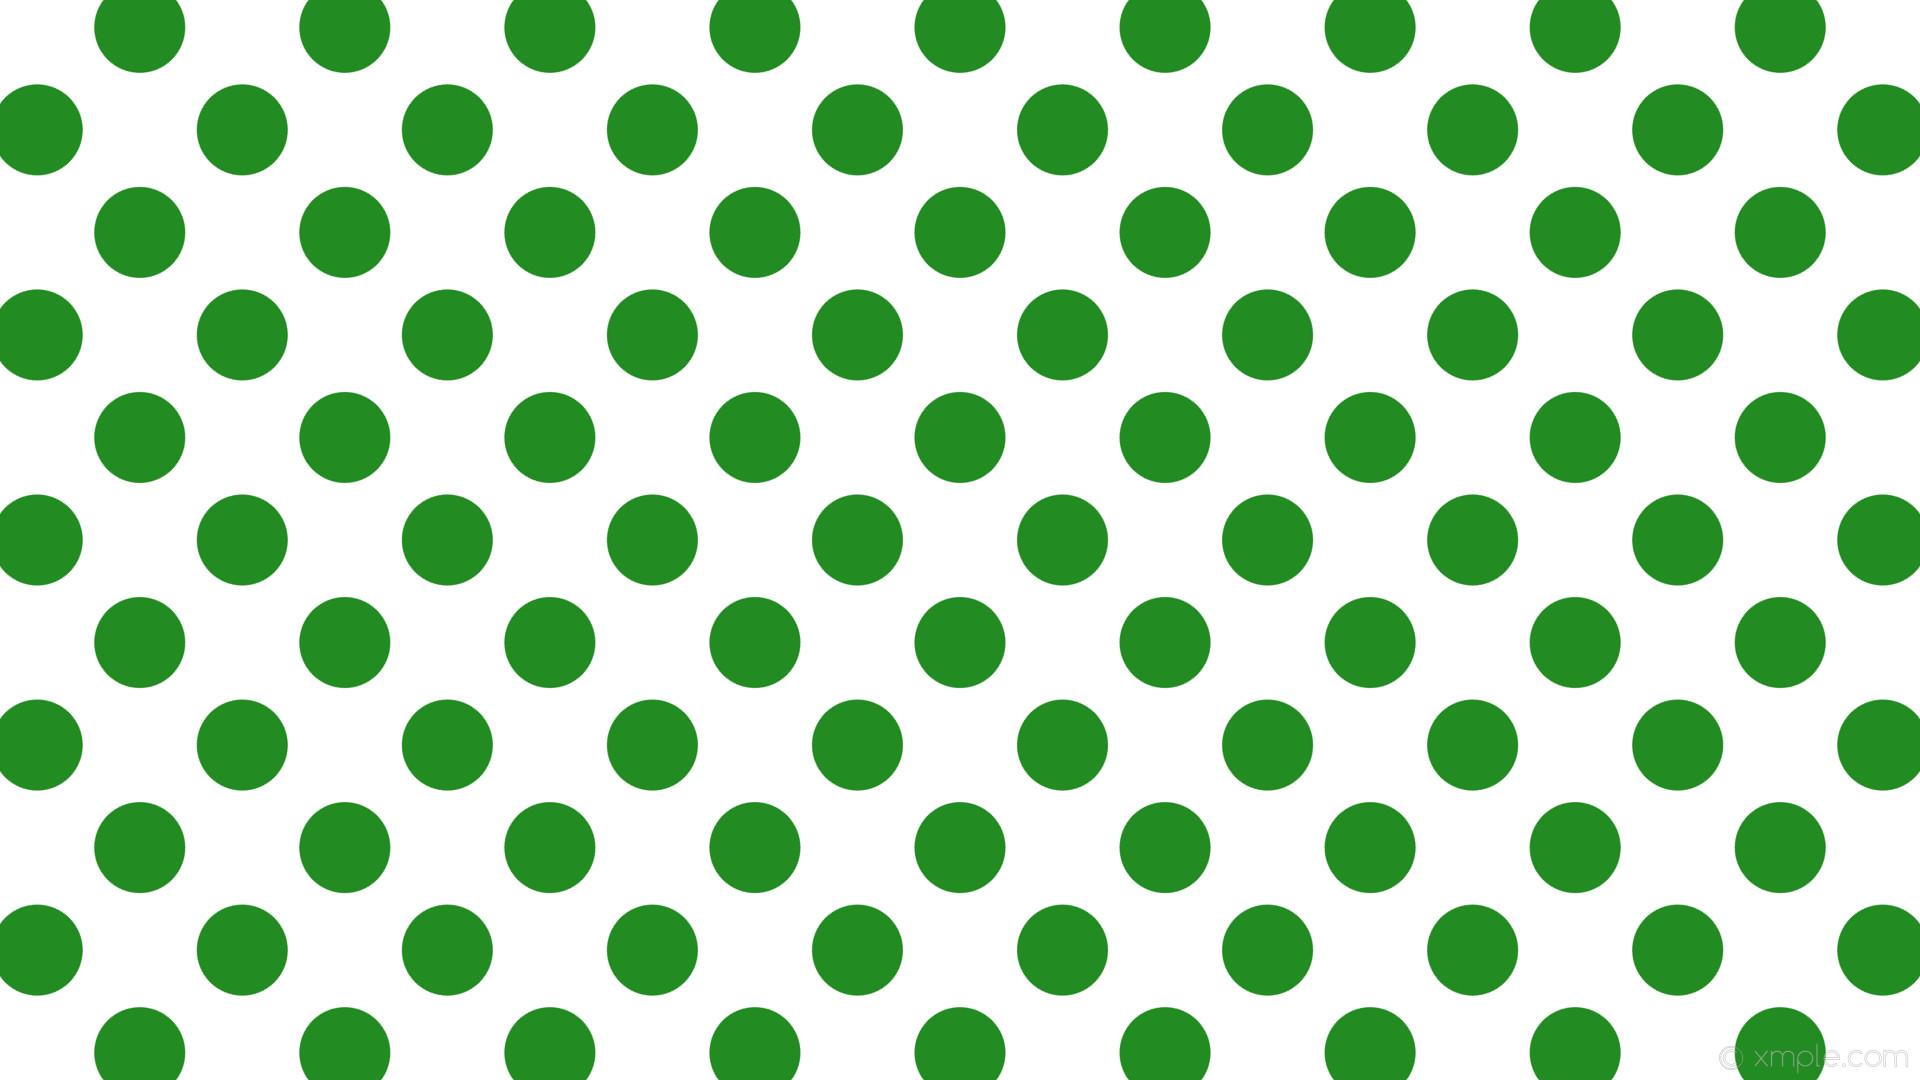 wallpaper white polka dots green spots forest green #ffffff #228b22 135°  91px 145px